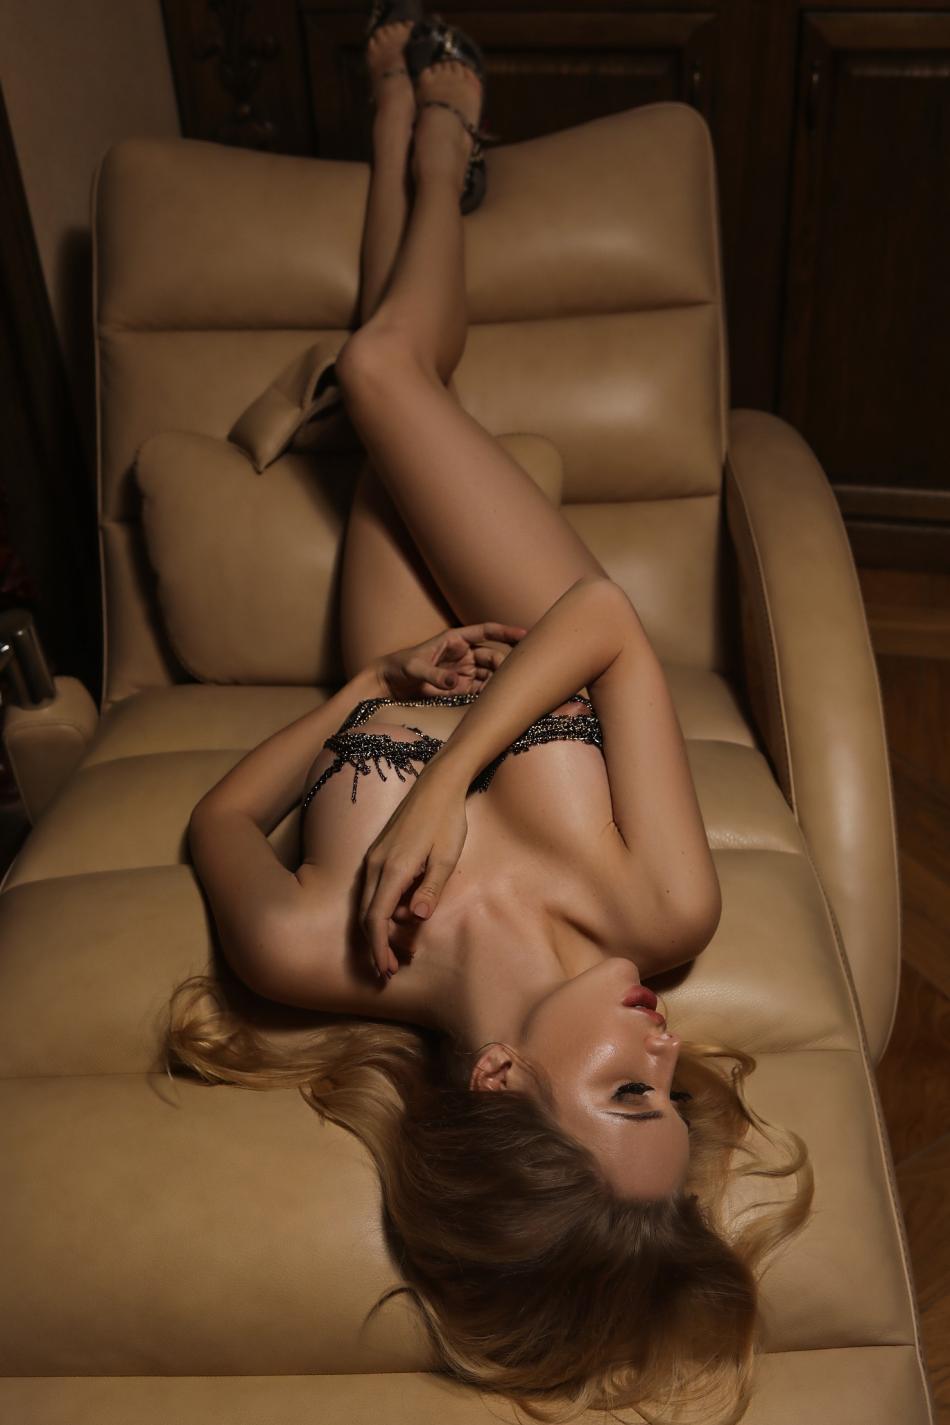 Ladyfordaddy.com Anisha Escort Girl In New York 24075840 - 4 4